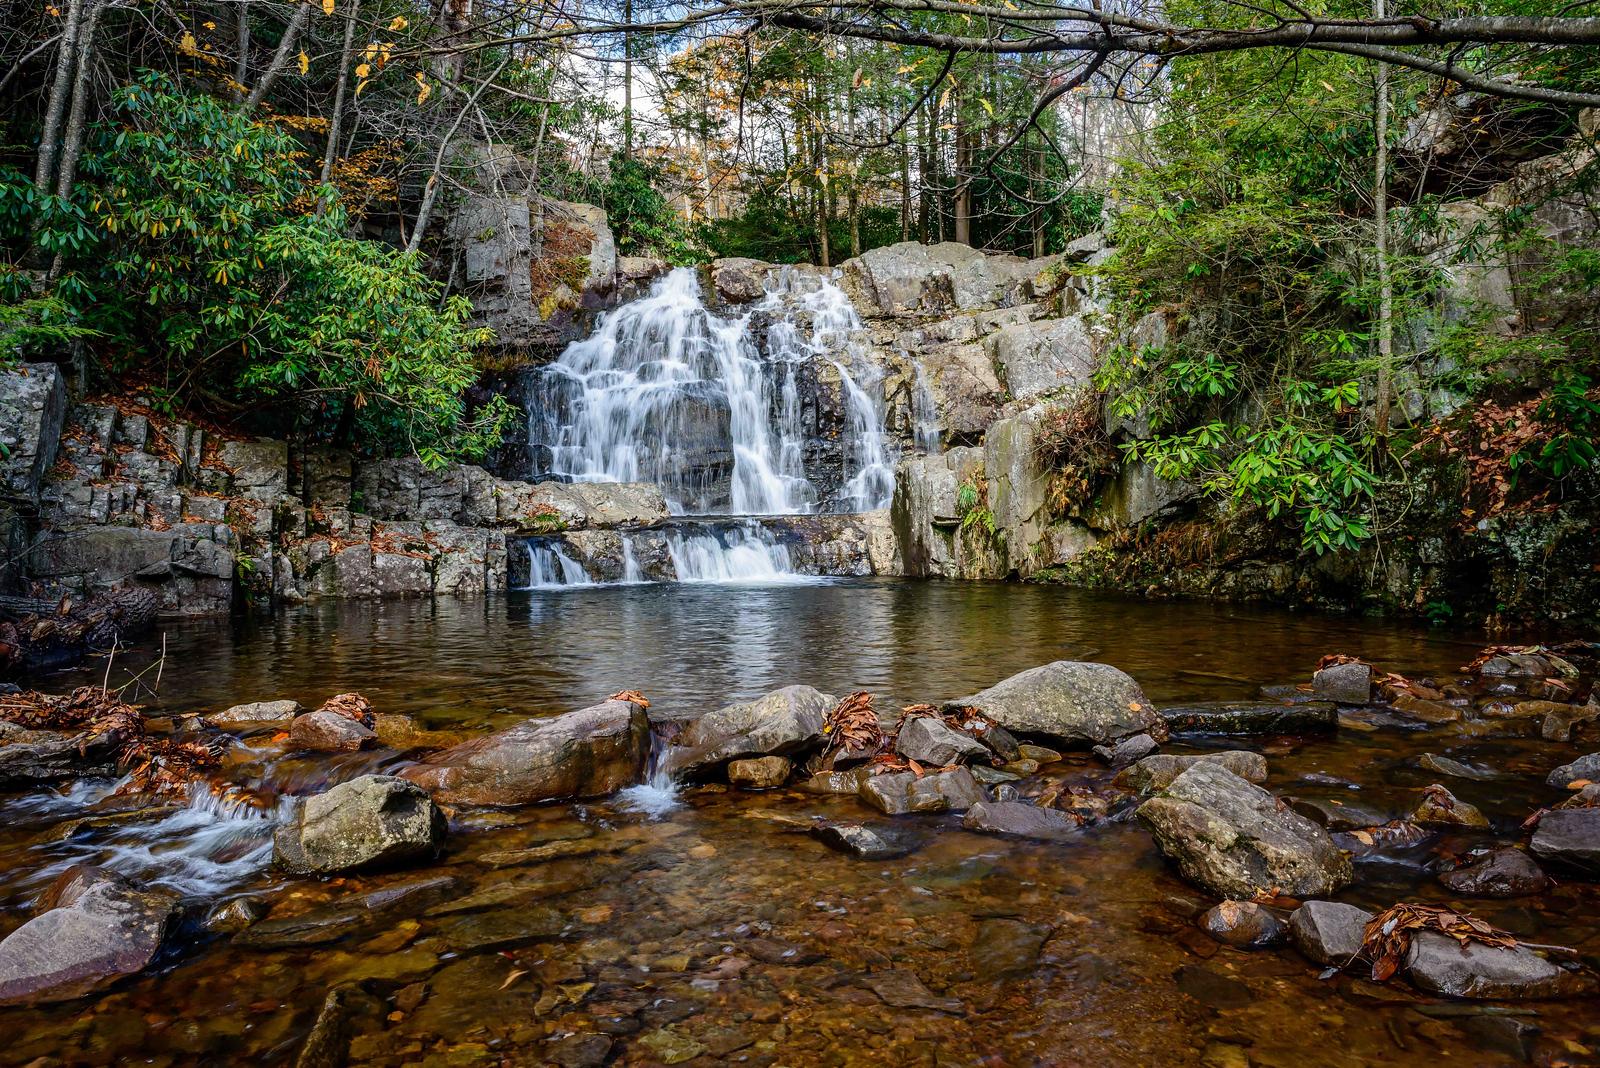 Maker:  Jim Lawrence Title:  Double Falls 2 Category:  Landscape/Travel Score:  13